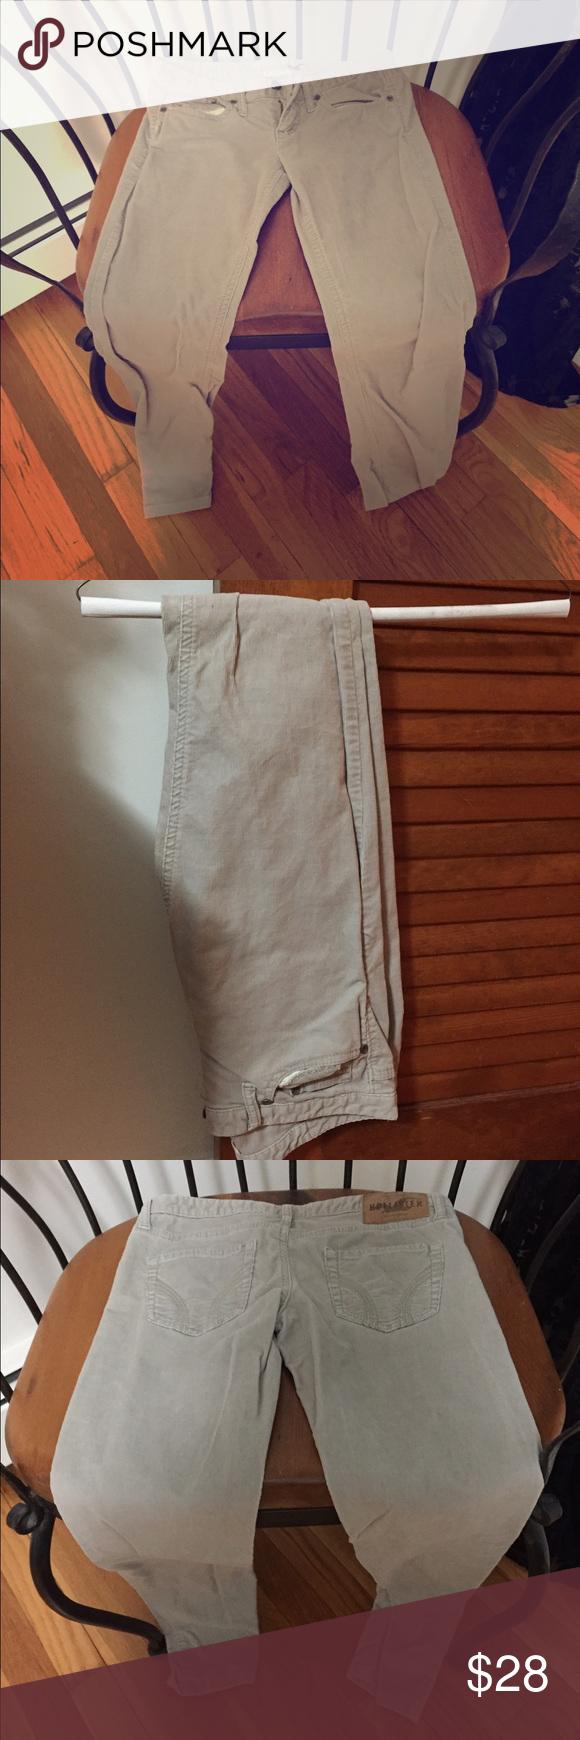 Hollister corduroy pants size 0 Gently worn Hollister corduroy pants size 0. Hollister Pants Skinny